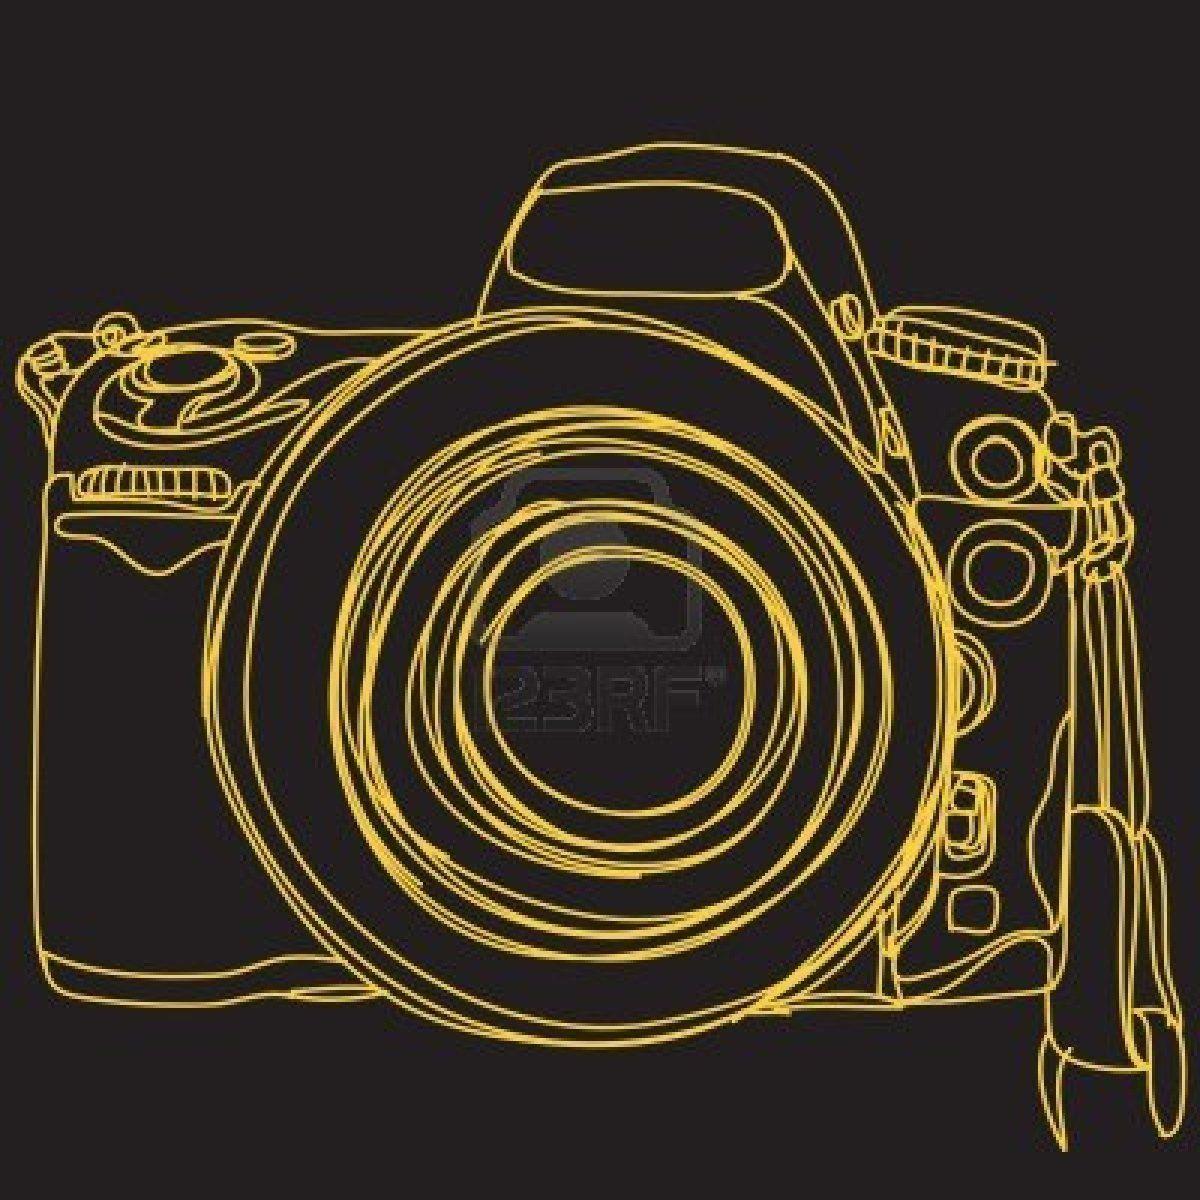 Stock Vector Camera illustration, Illustration, Photography